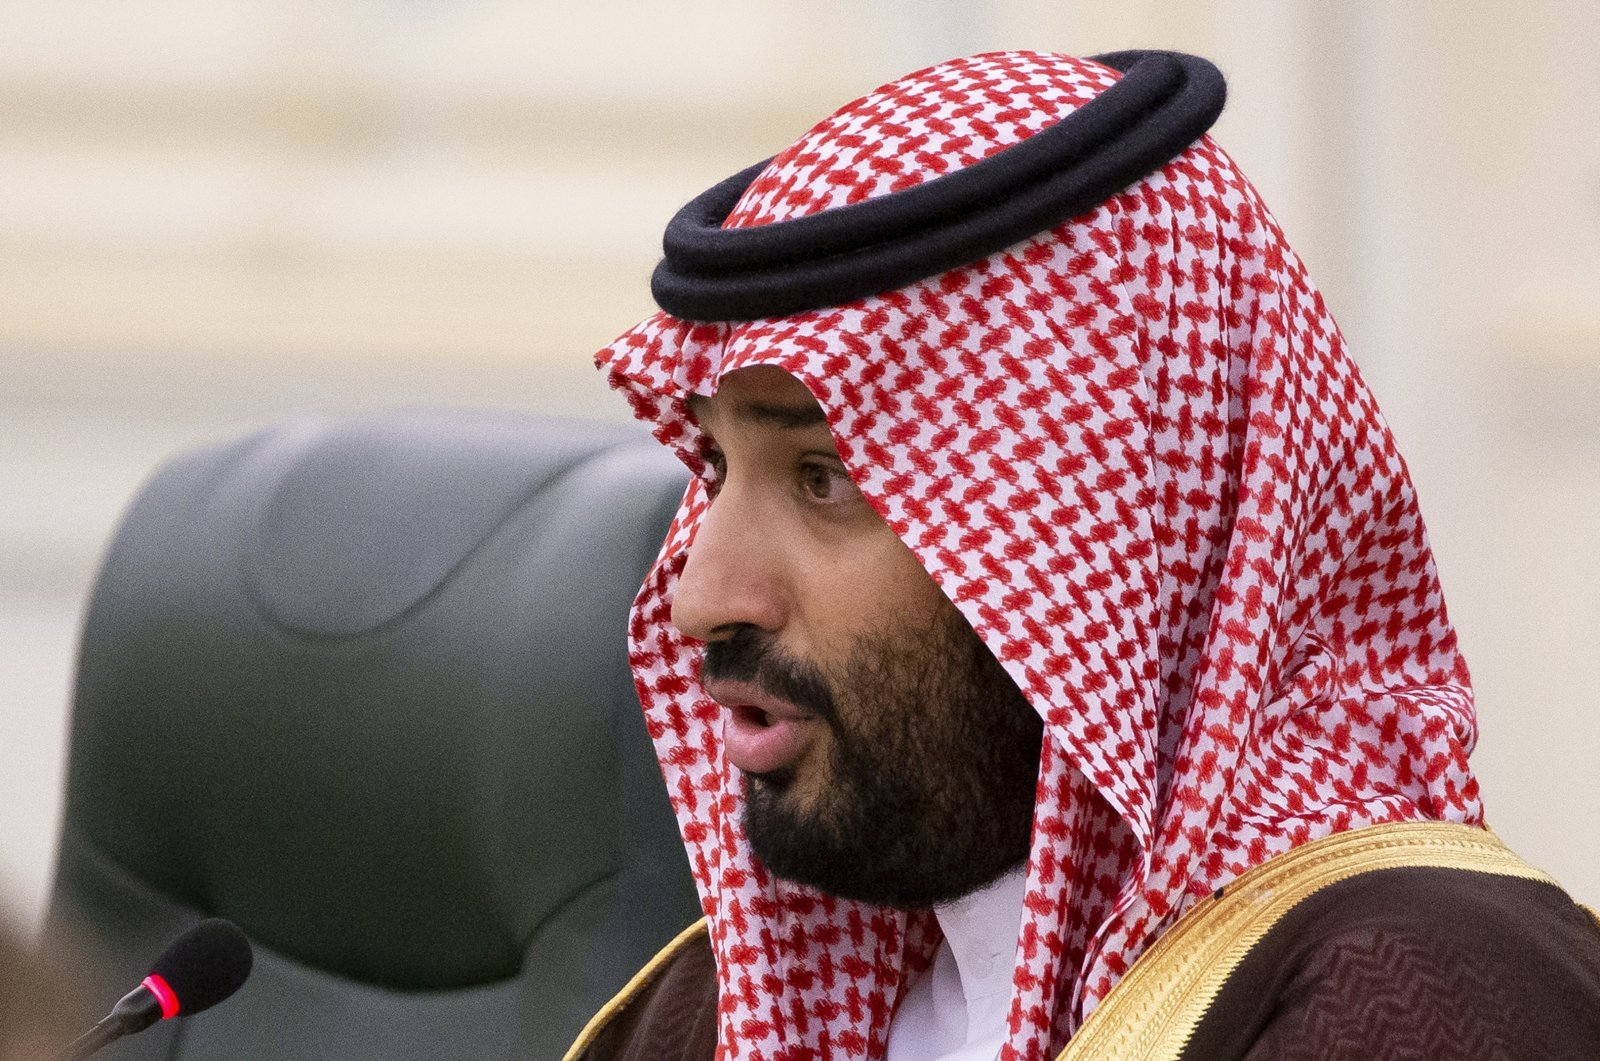 Saudi Arabia's Crown Prince M. bin Salman speaks to Russian President Vladimir Putin during talks in Riyadh, Saudi Arabia on Oct. 14, 2019. (AP Photo)